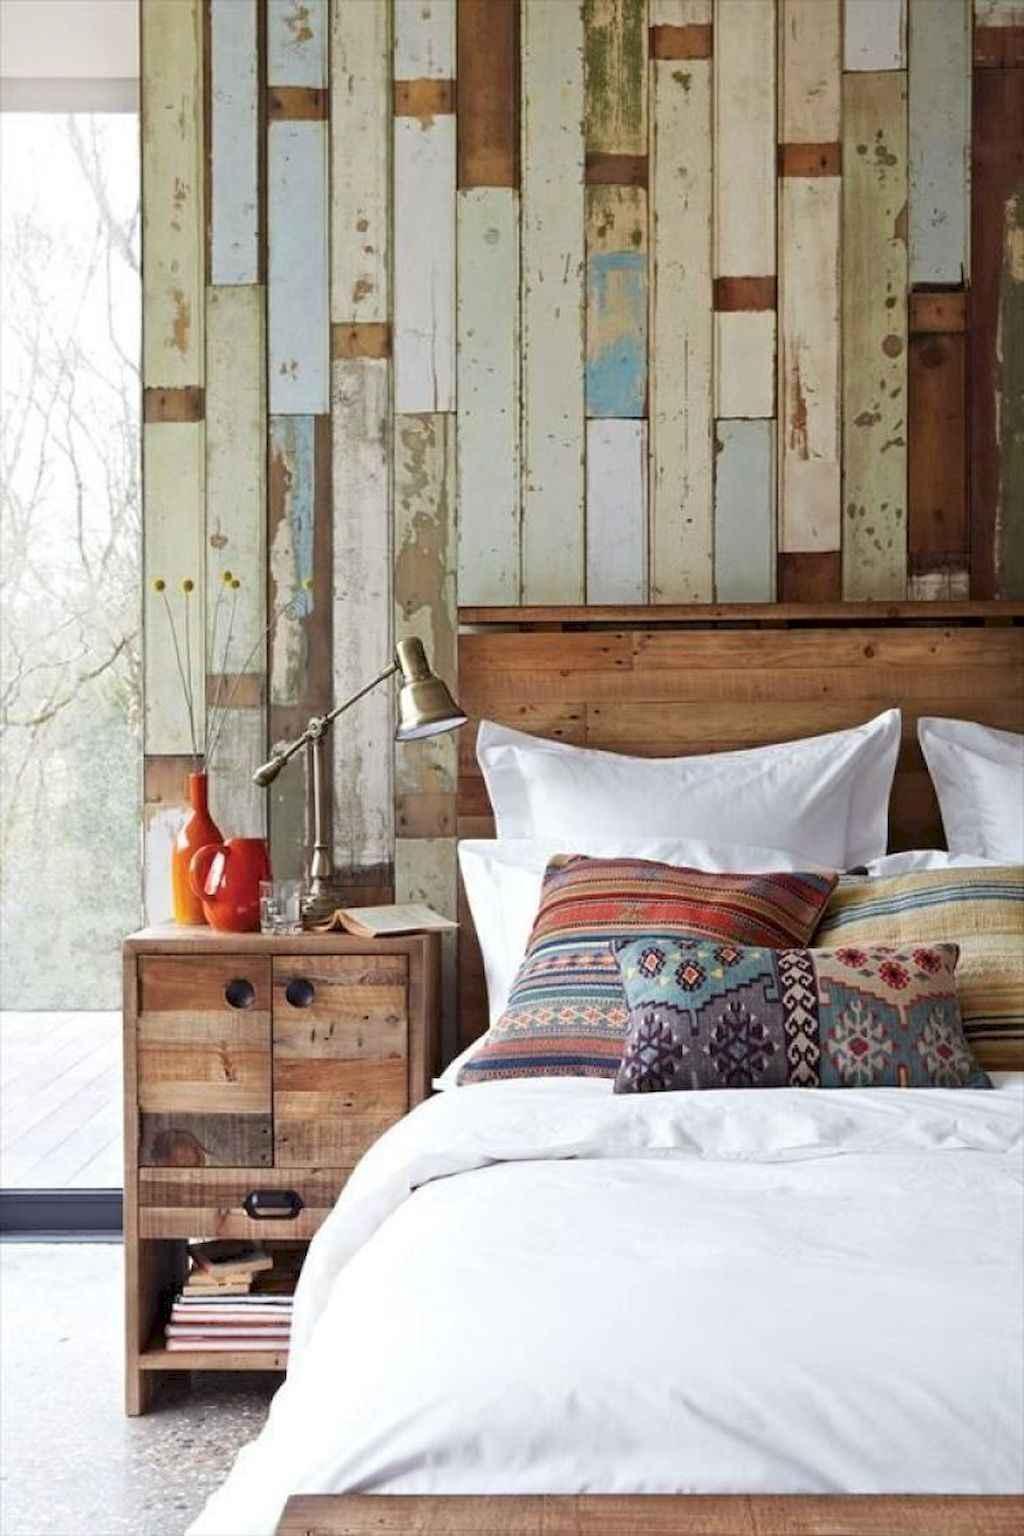 Modern Farmhouse Bedroom Decorating Ideas: 90 Modern Farmhouse Style Master Bedroom Ideas